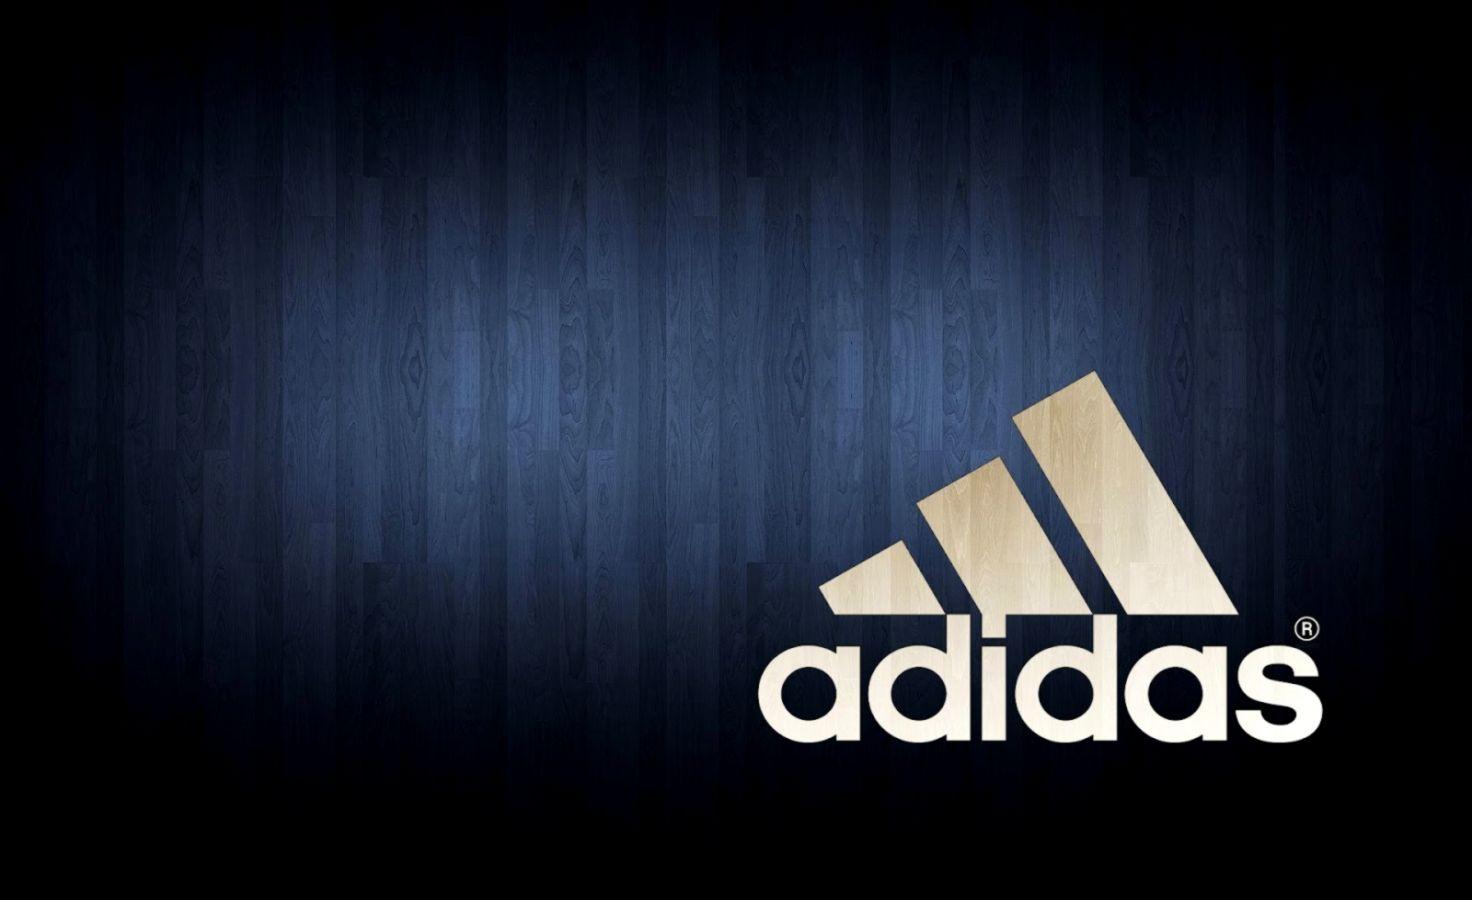 Adidas New Logo Desktop Design Wallpapers Supreme